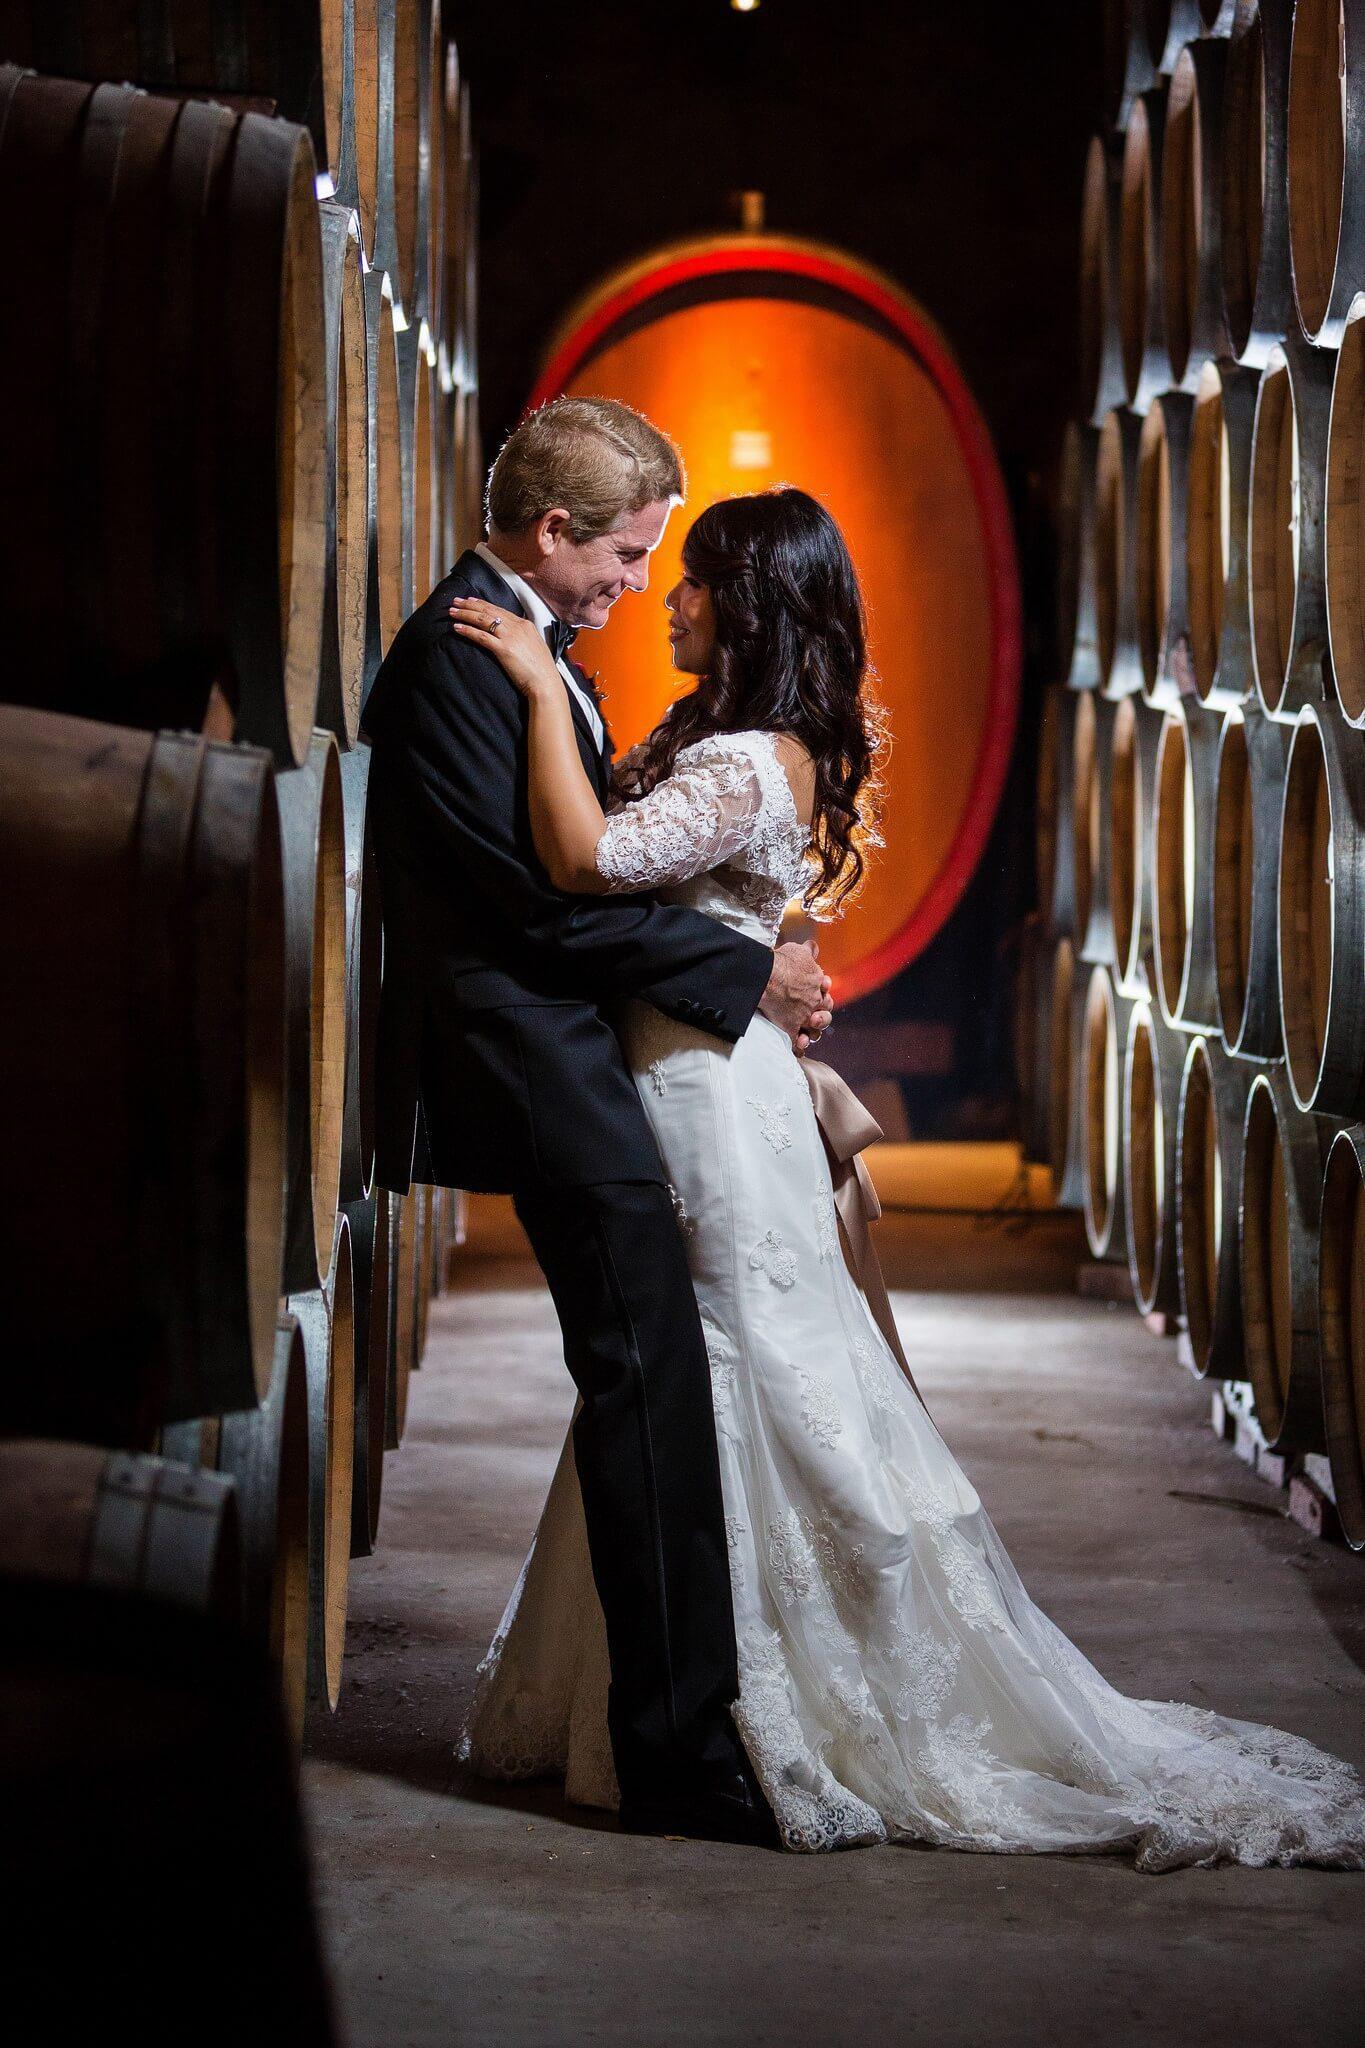 v sattui barrell room, wine barrels, v sattui winery, things to do in napa, wine tasting